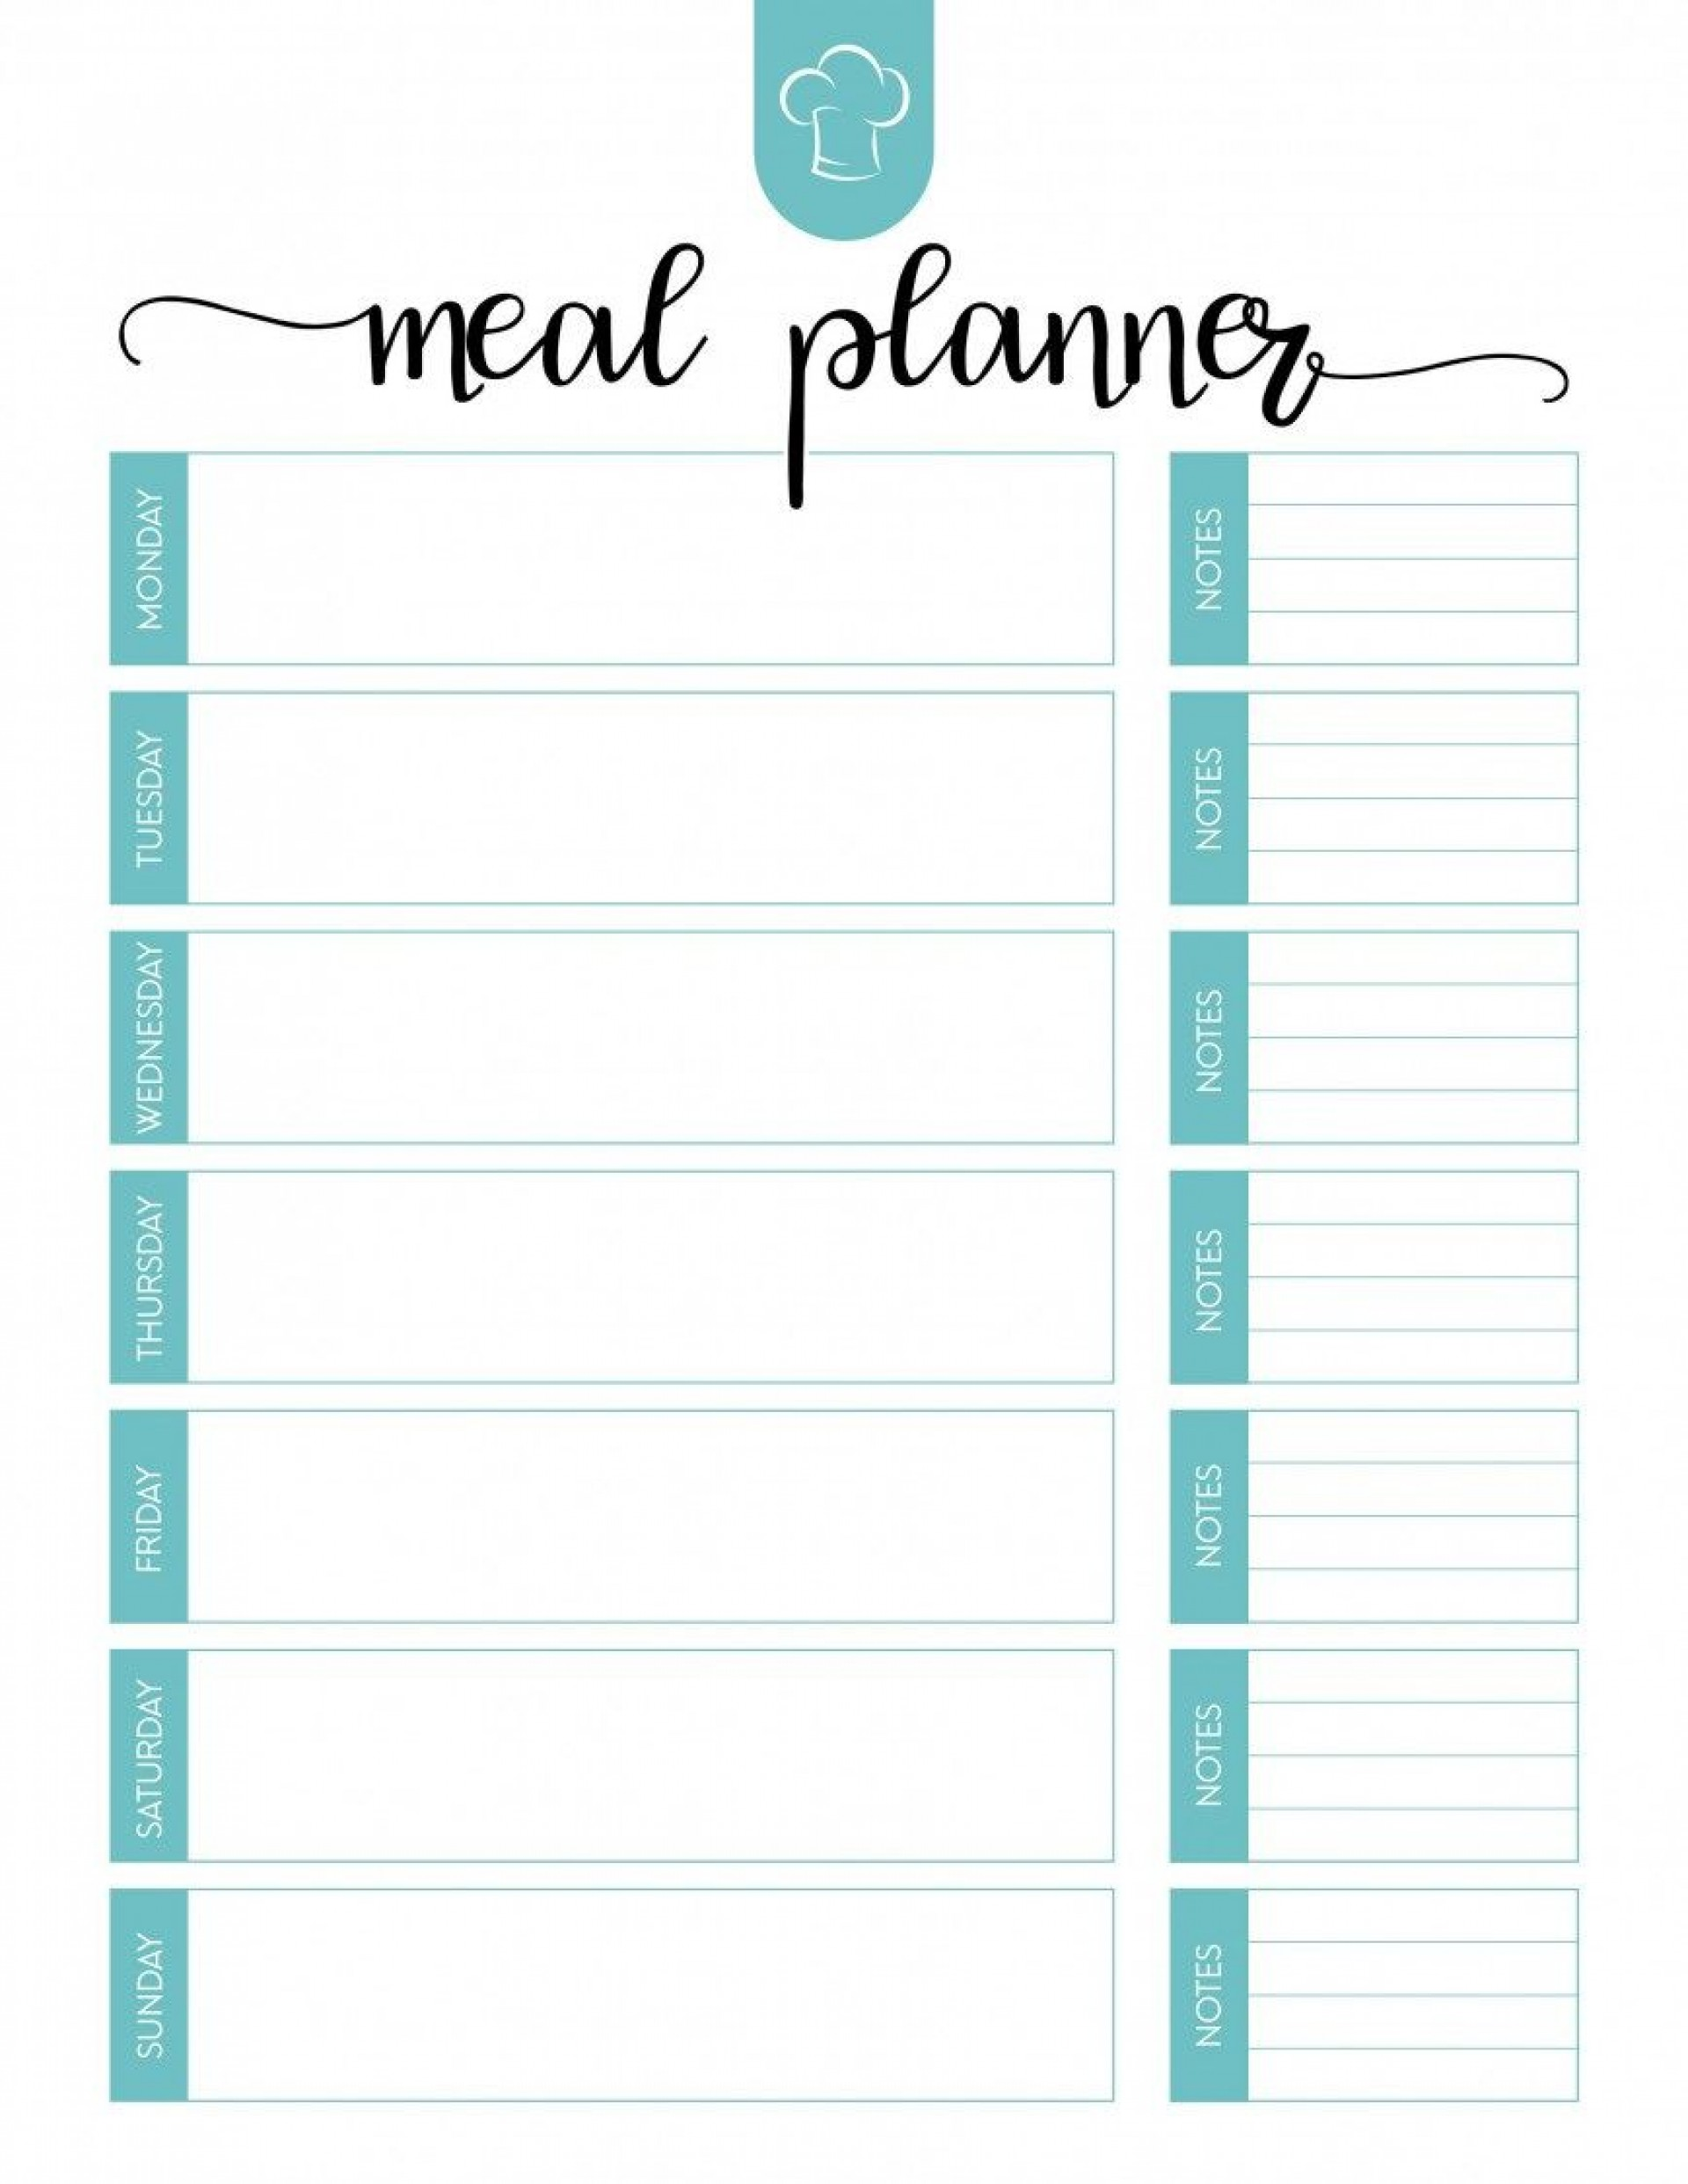 006 Wonderful Weekly Meal Plan Template App Example  Apple Page1920